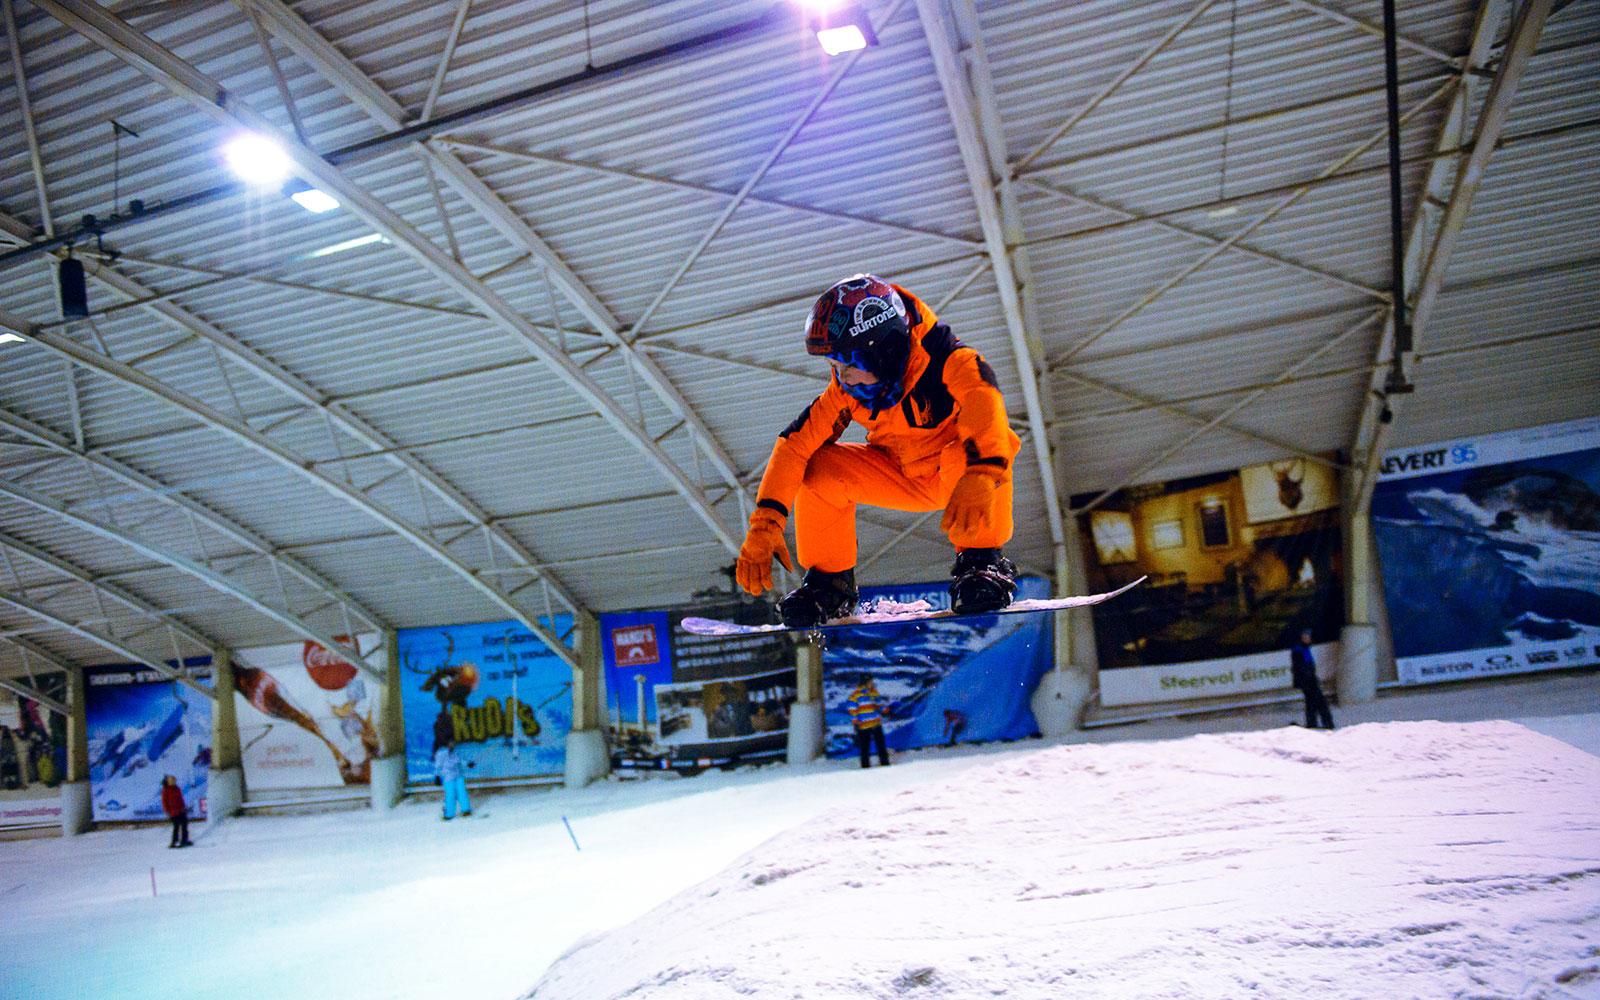 Snowboarden bij Snow Planet in Amsterdam